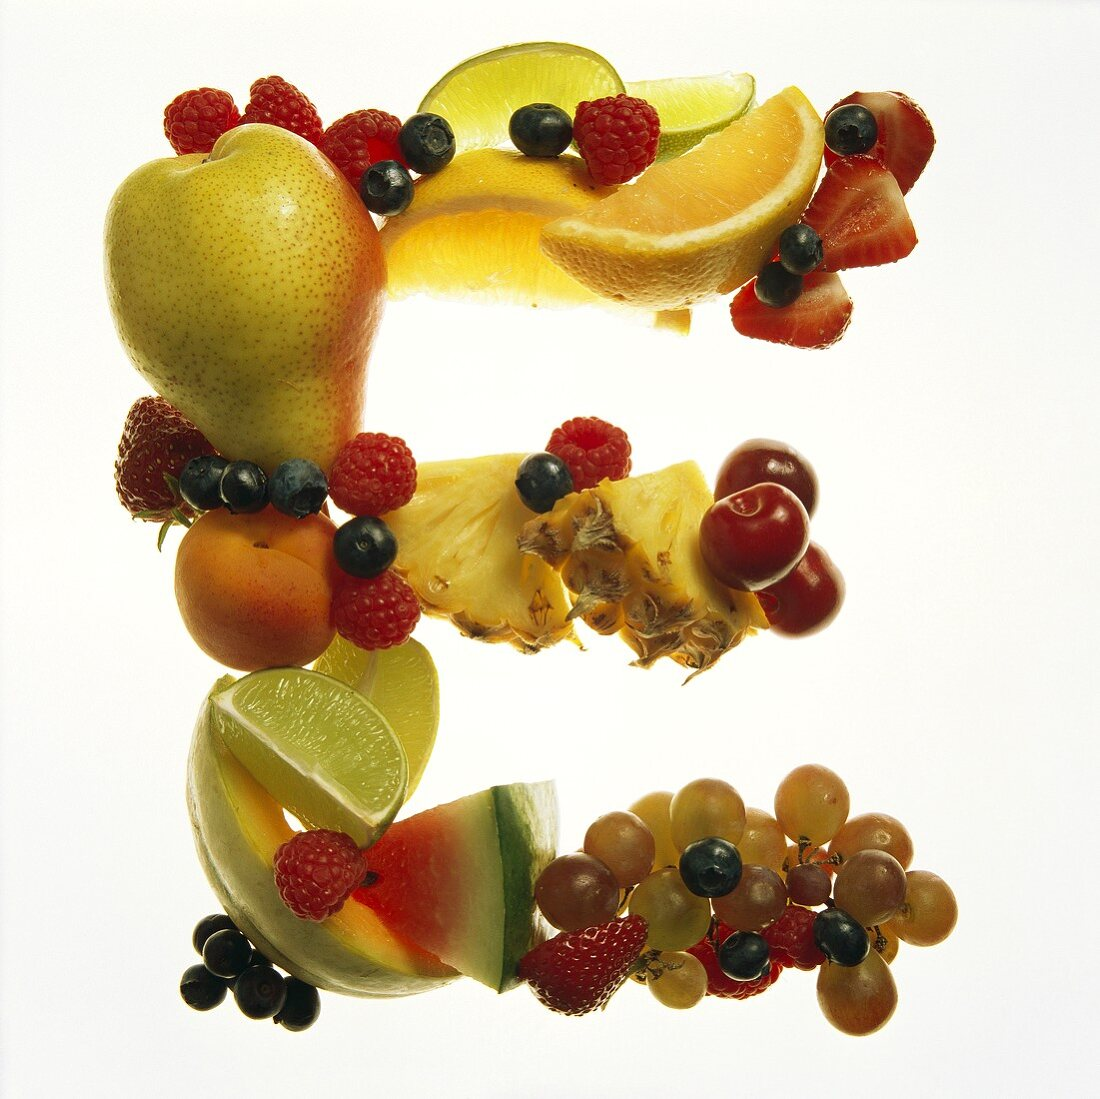 Fruit Forming the Letter E